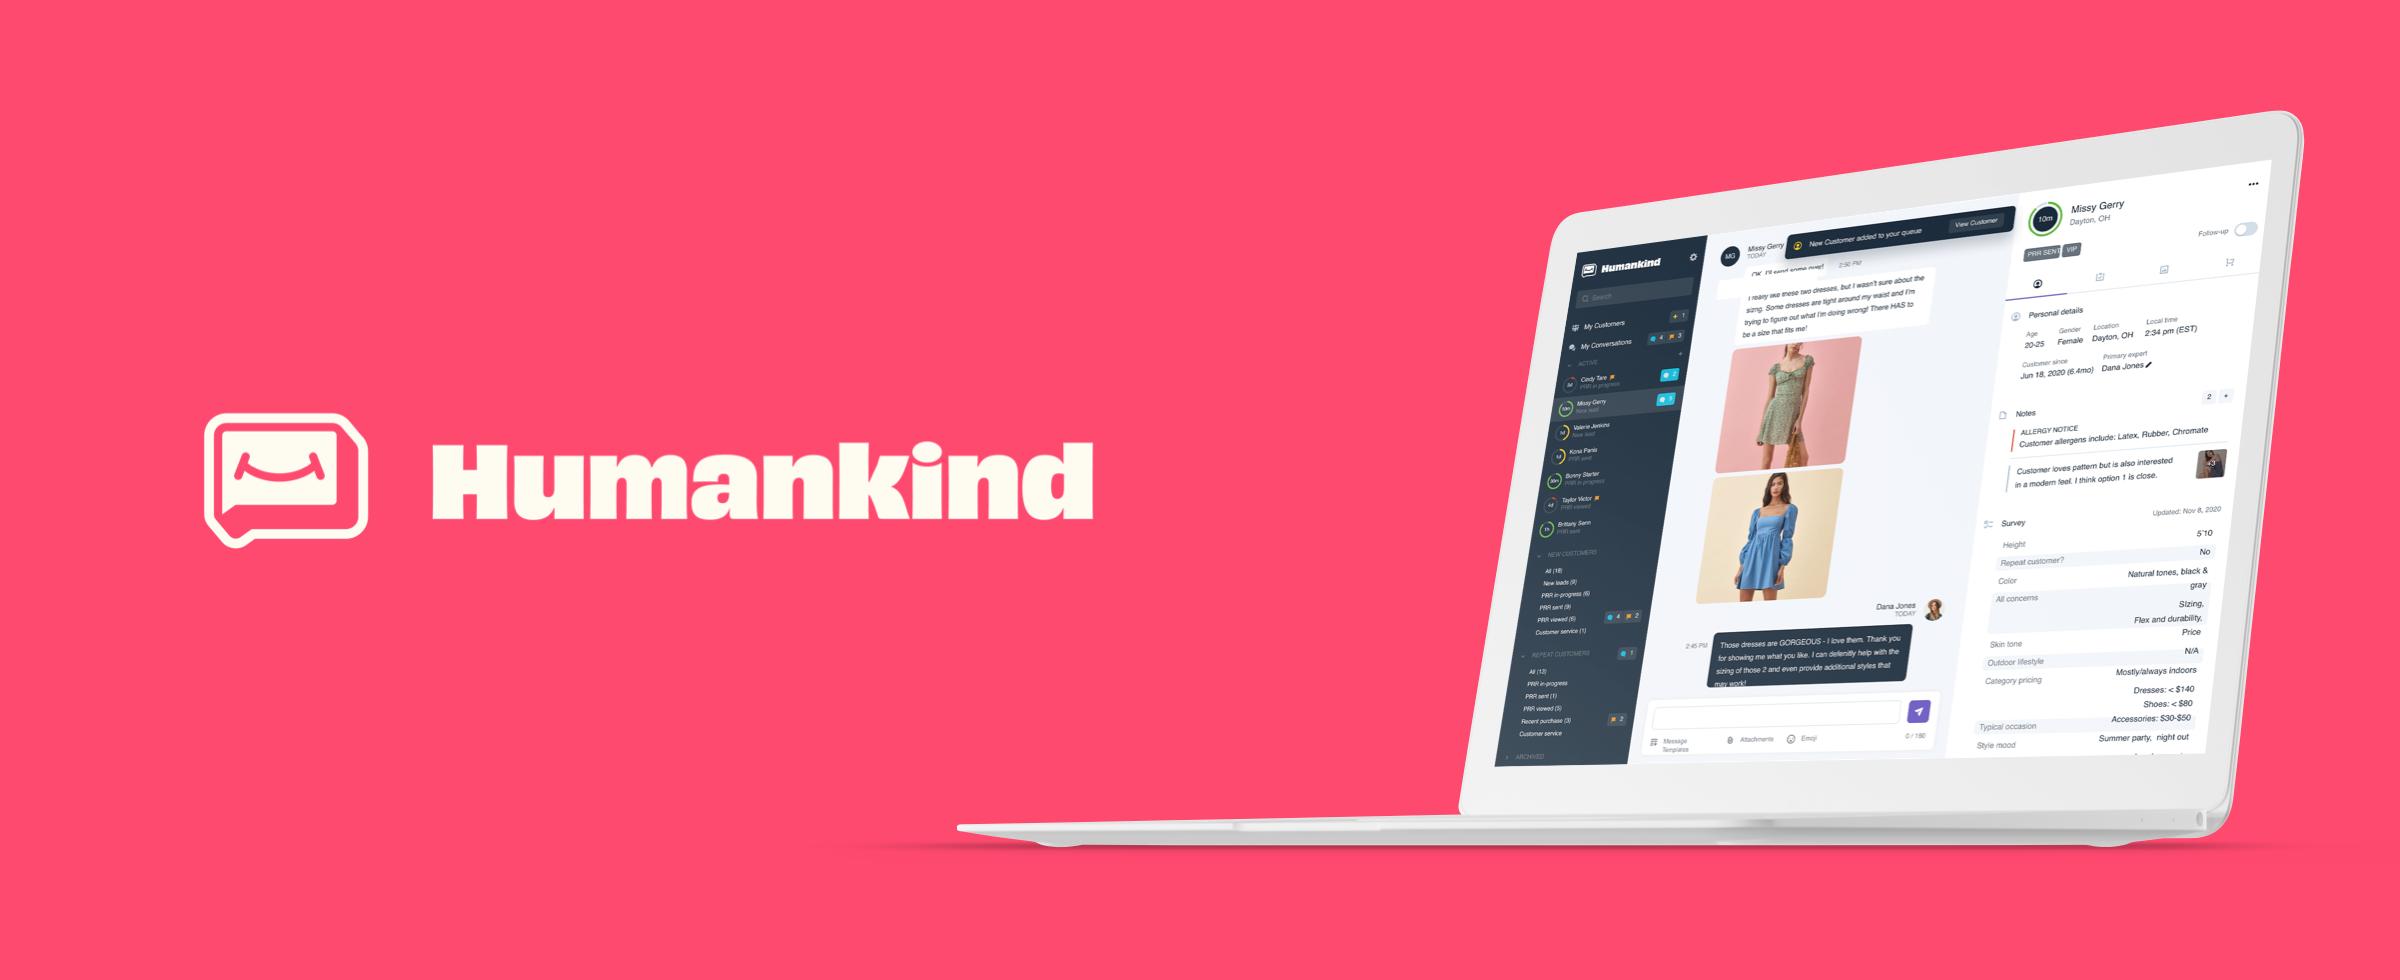 High Alpha Launches Humankind, a Digital Concierge Platform